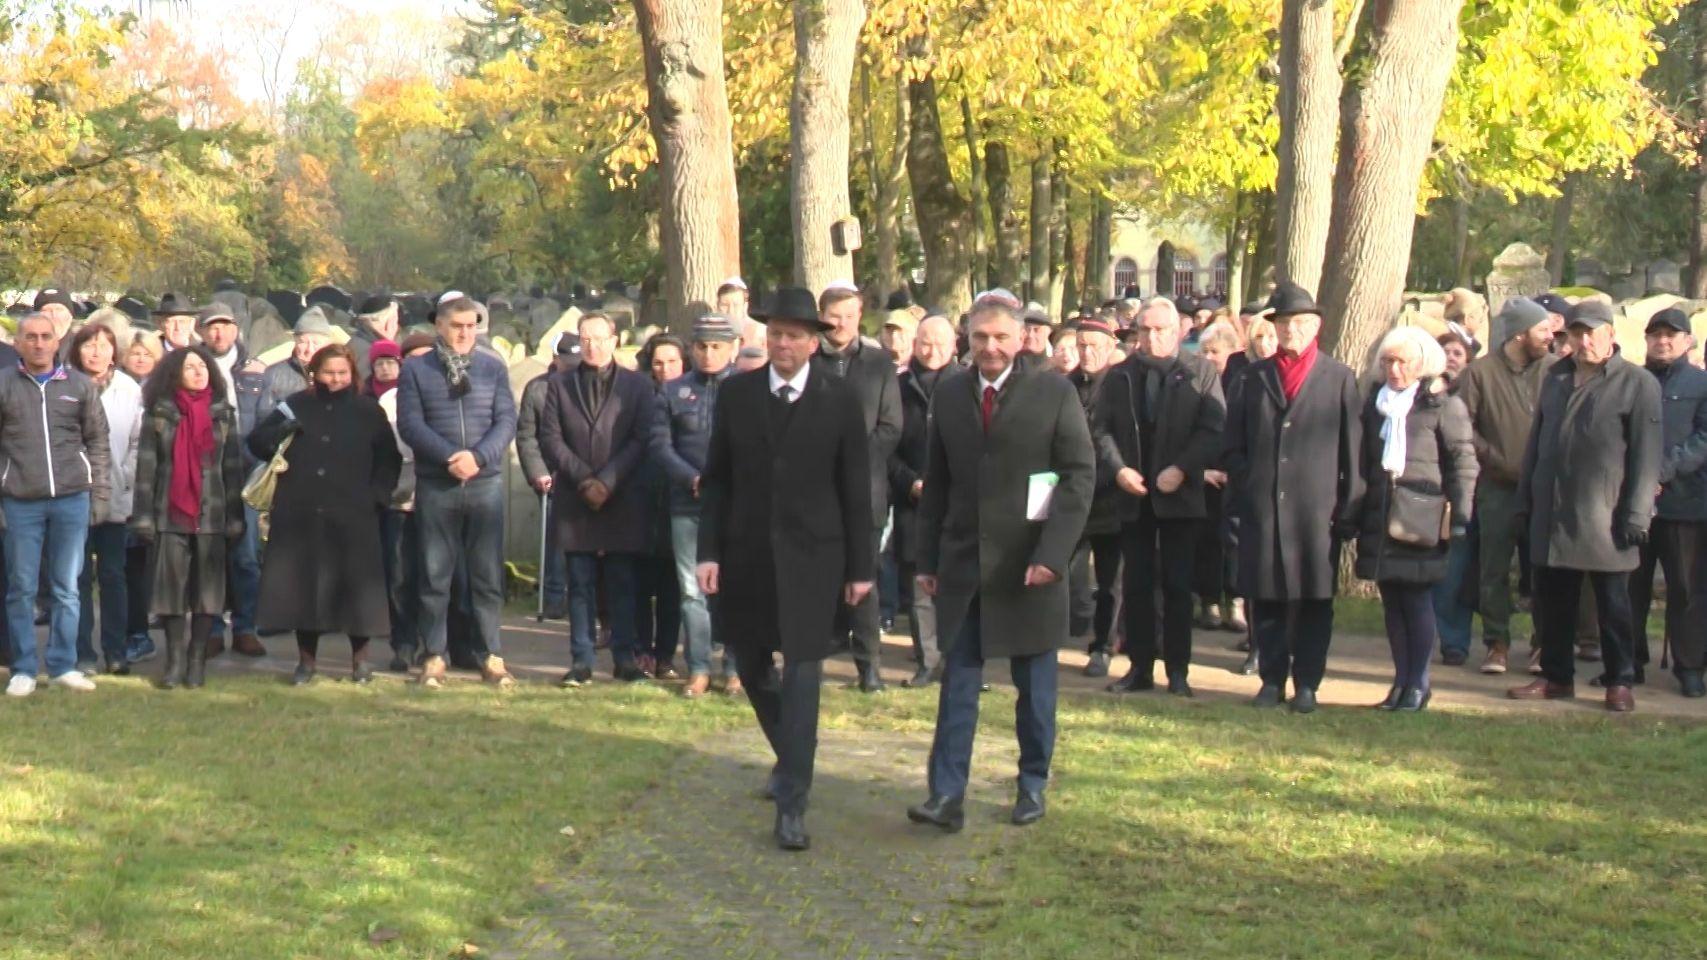 Kranzniederlegung am Isrealitischen Friedhof in Nürnberg